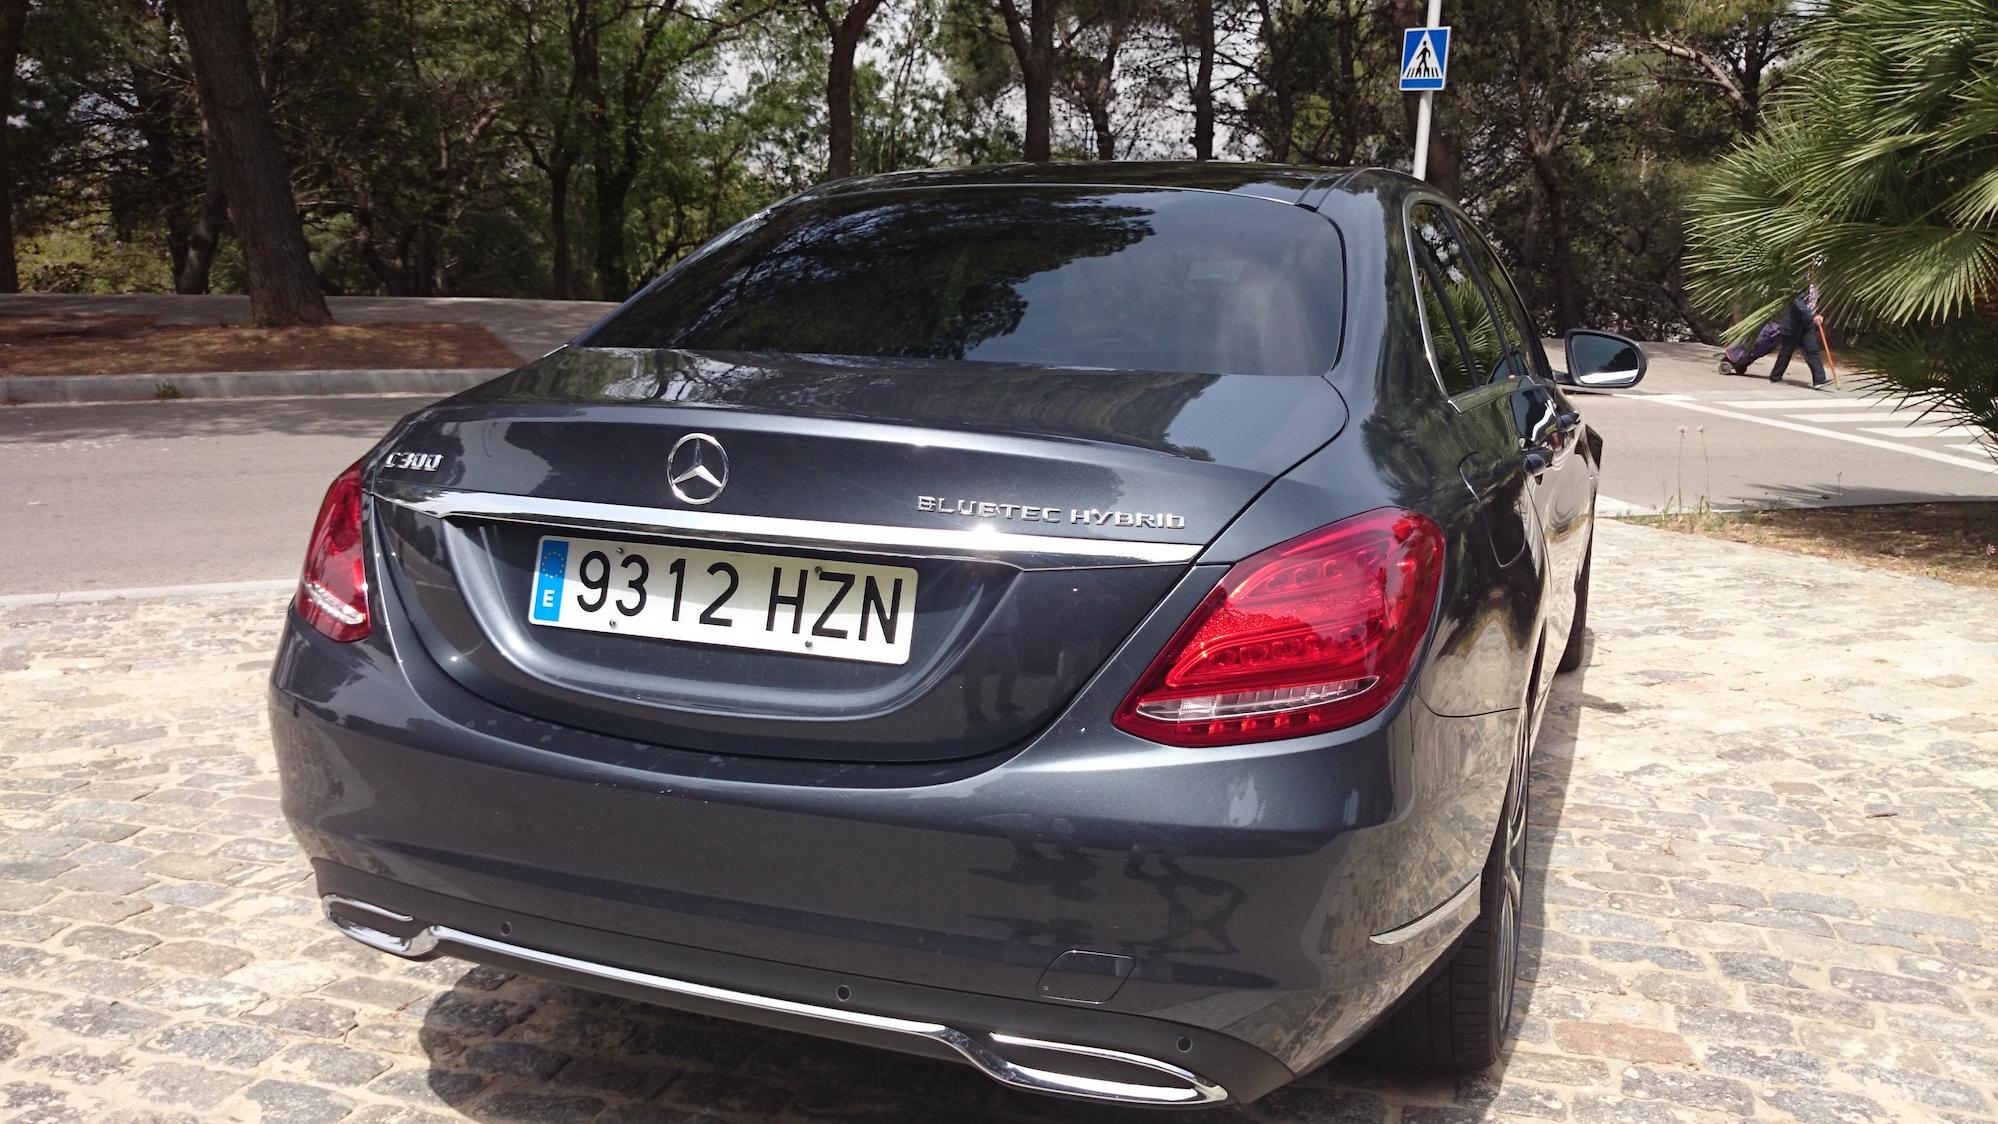 Mercedes C300 Bluetec Hybrid